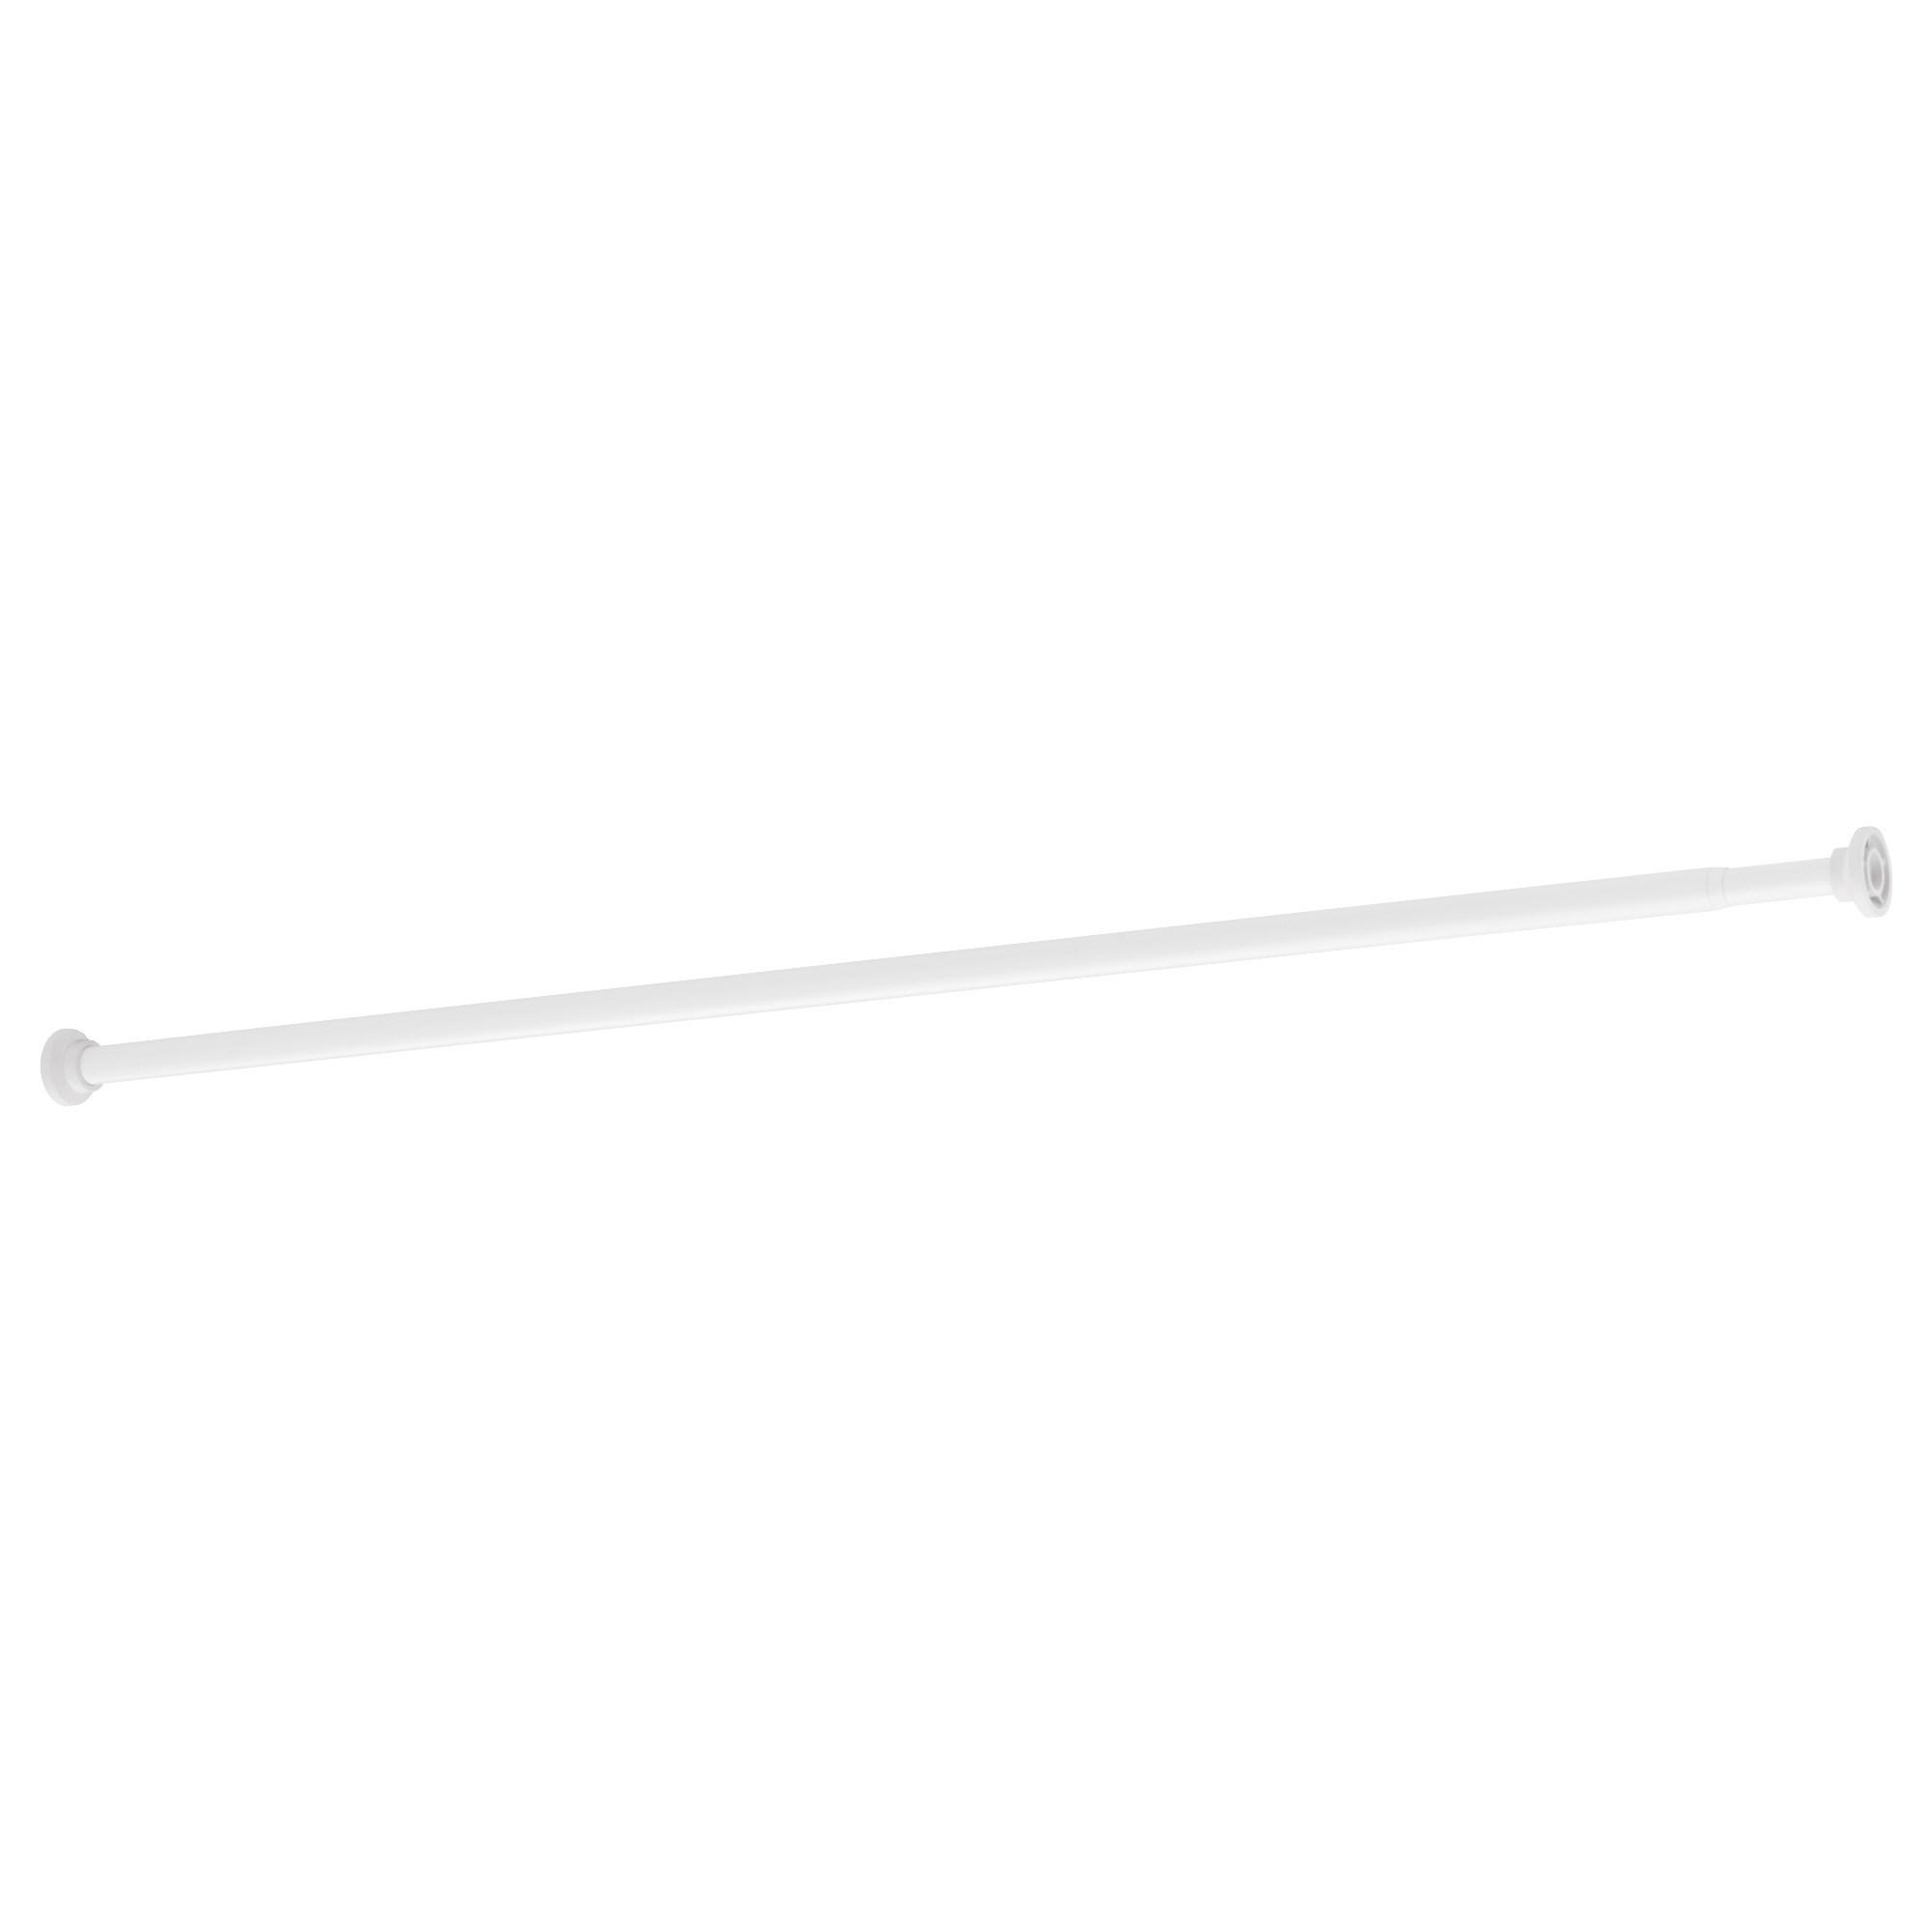 botaren shower curtain rod white 120-200 cm | ikea bathroom